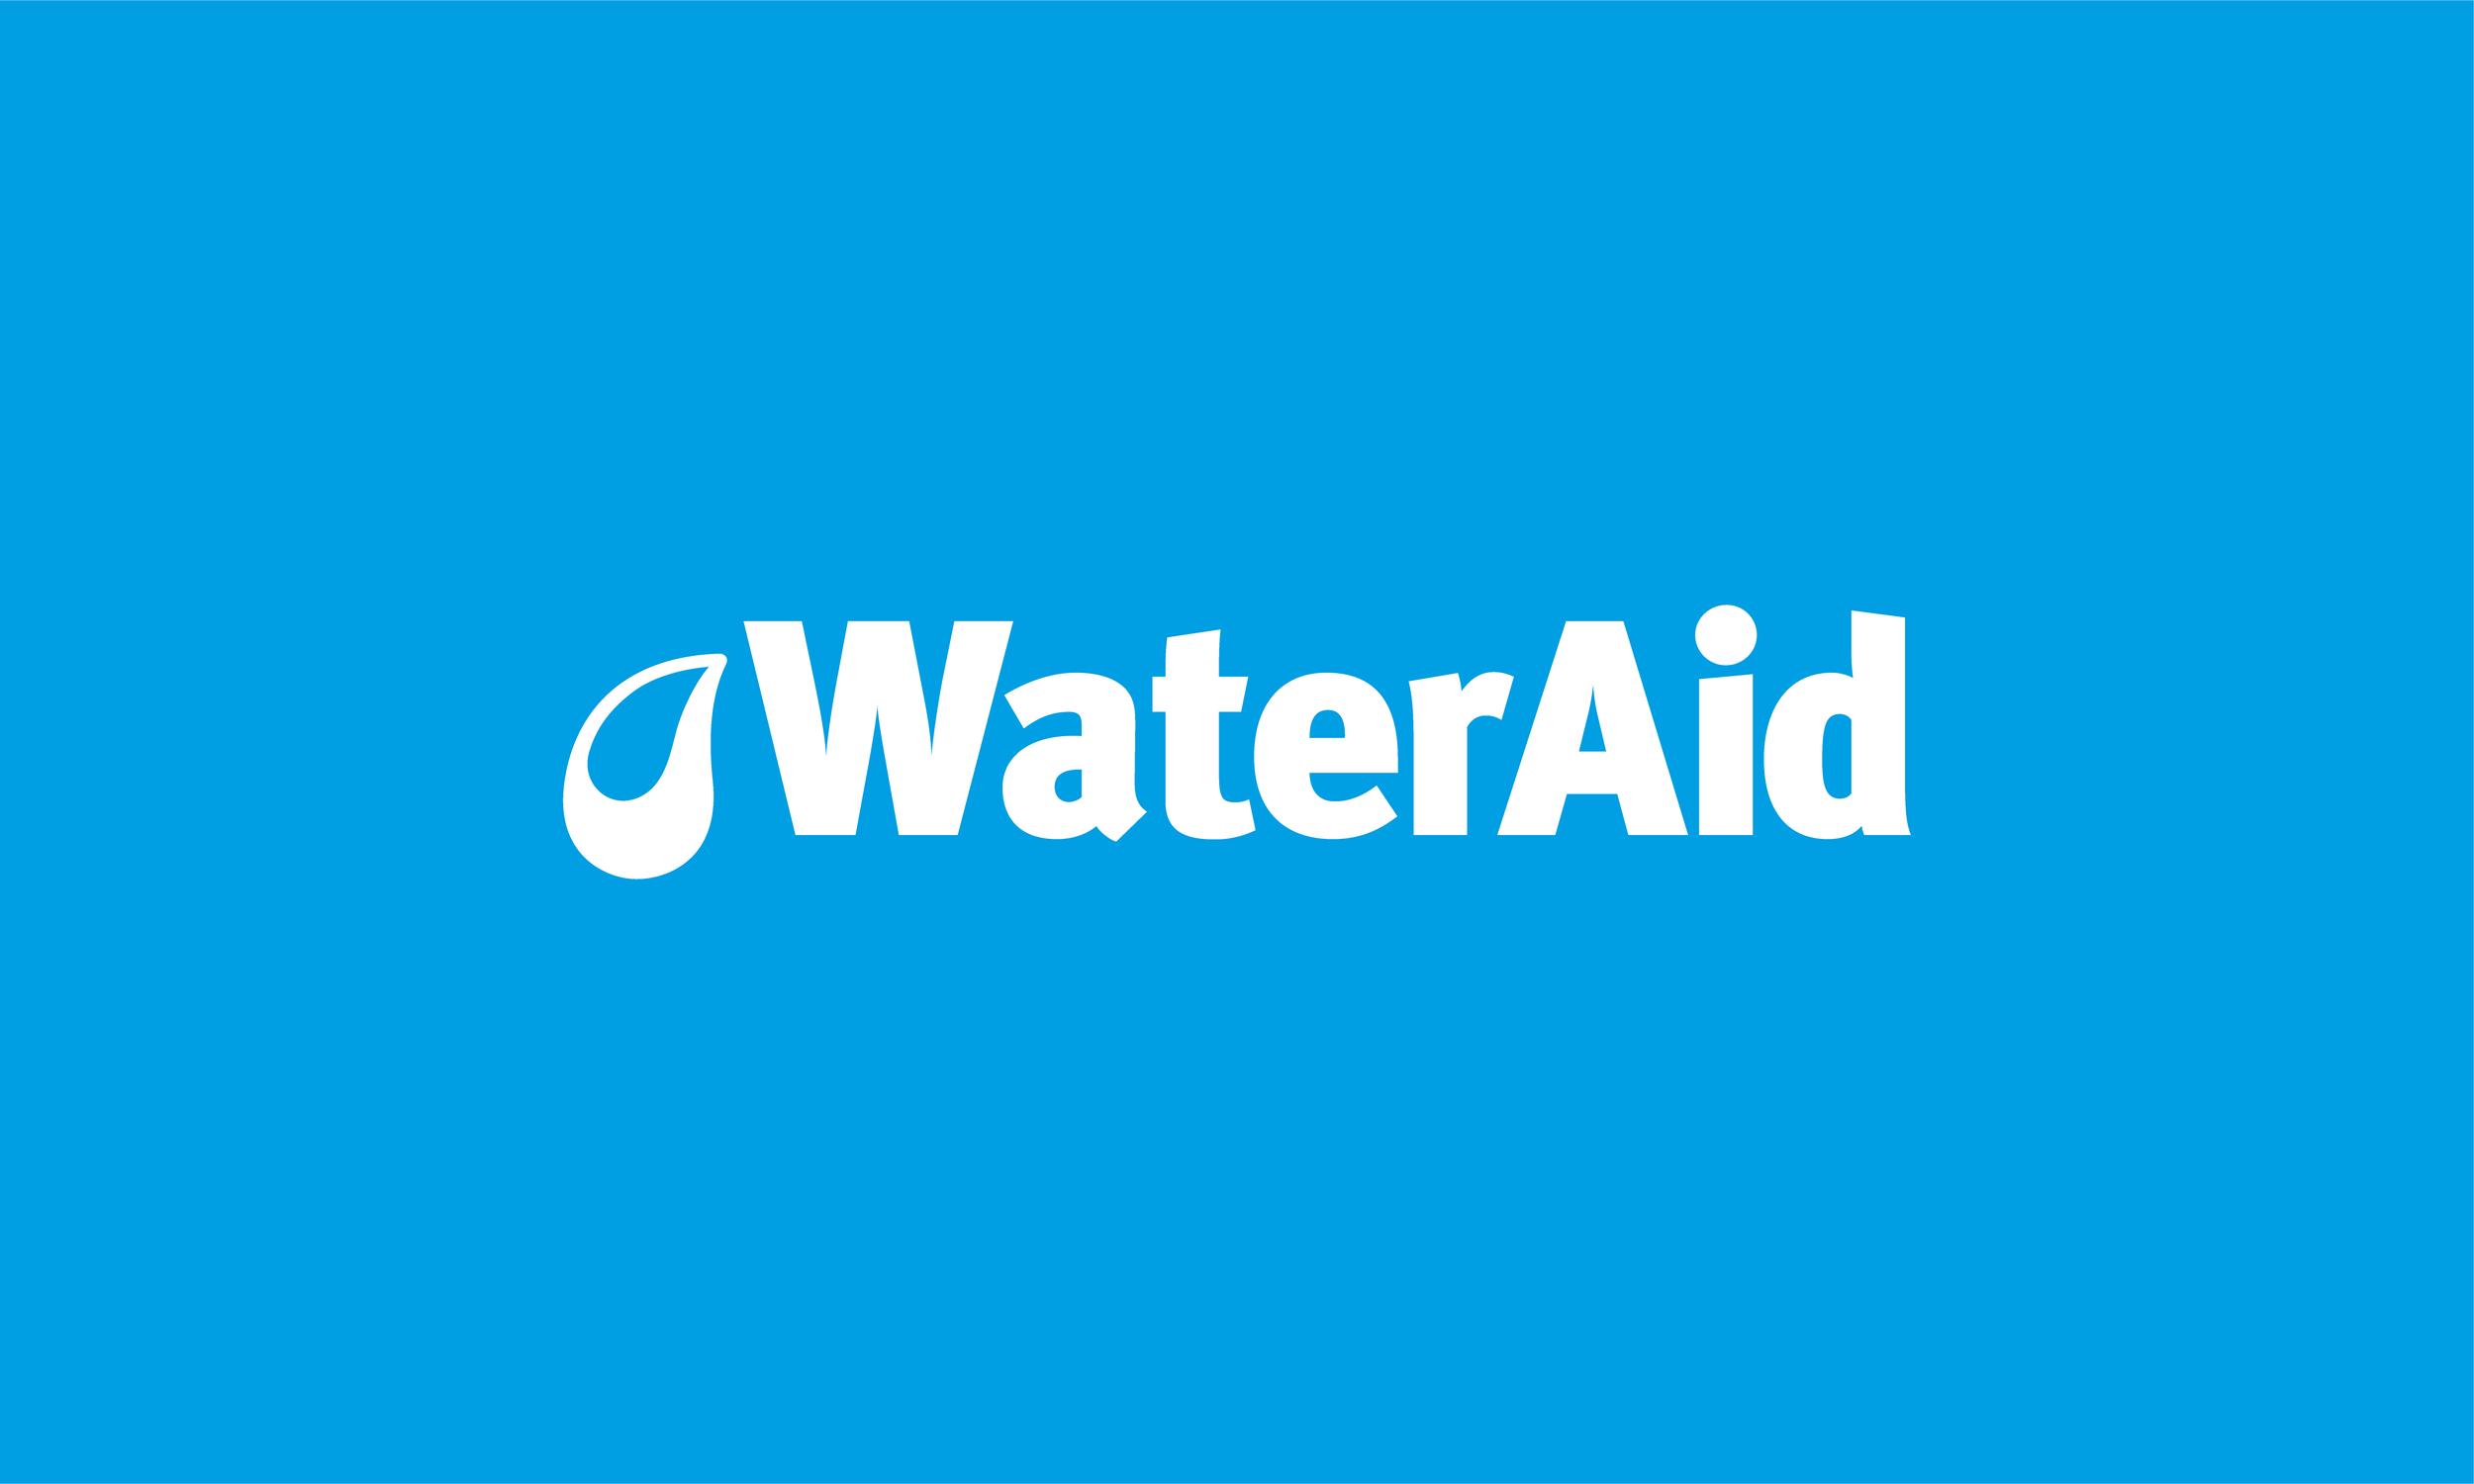 WATERAID WEB ELEMENTS-02.png